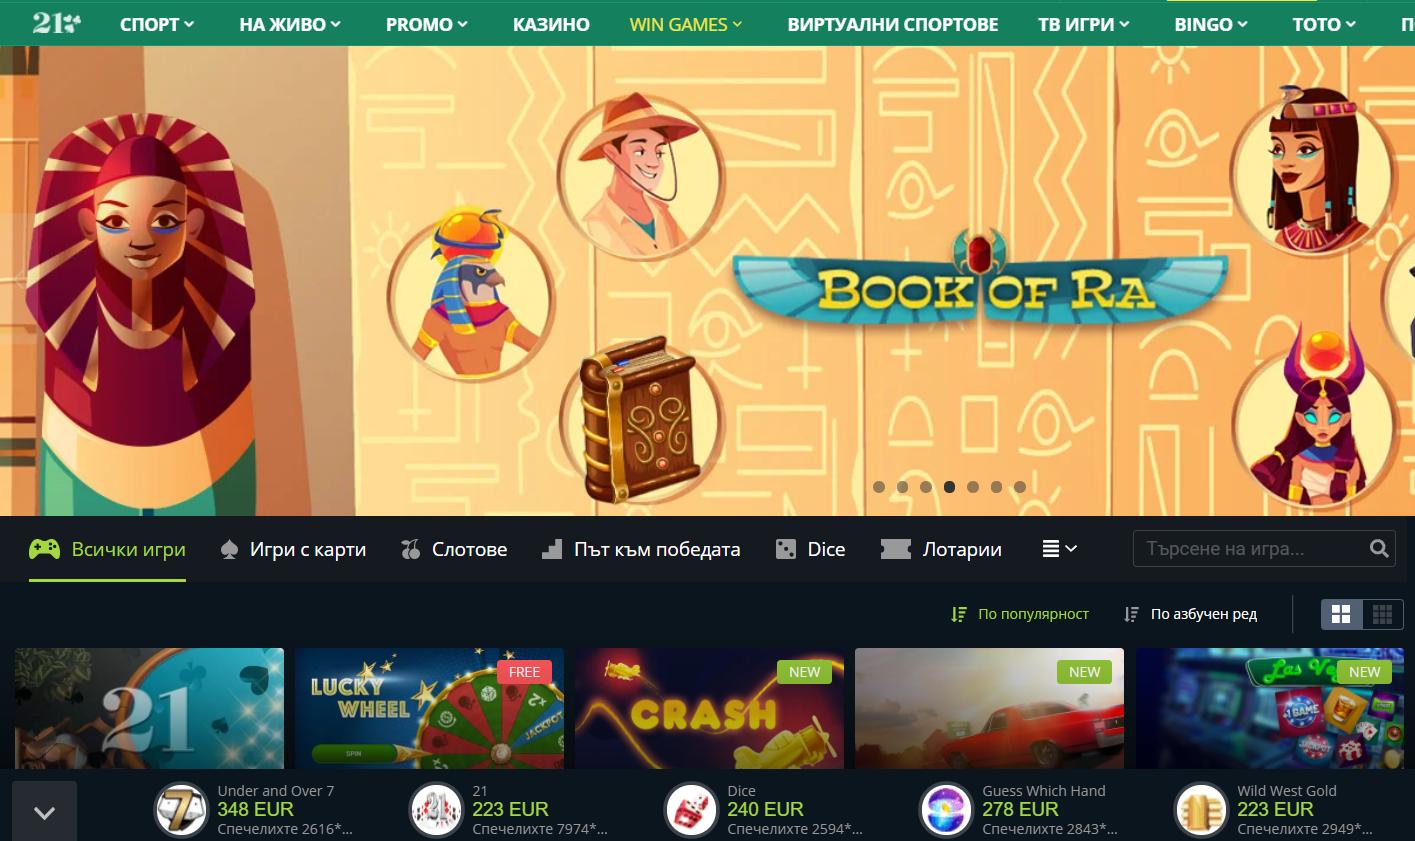 betwinner win games-komarbet.com